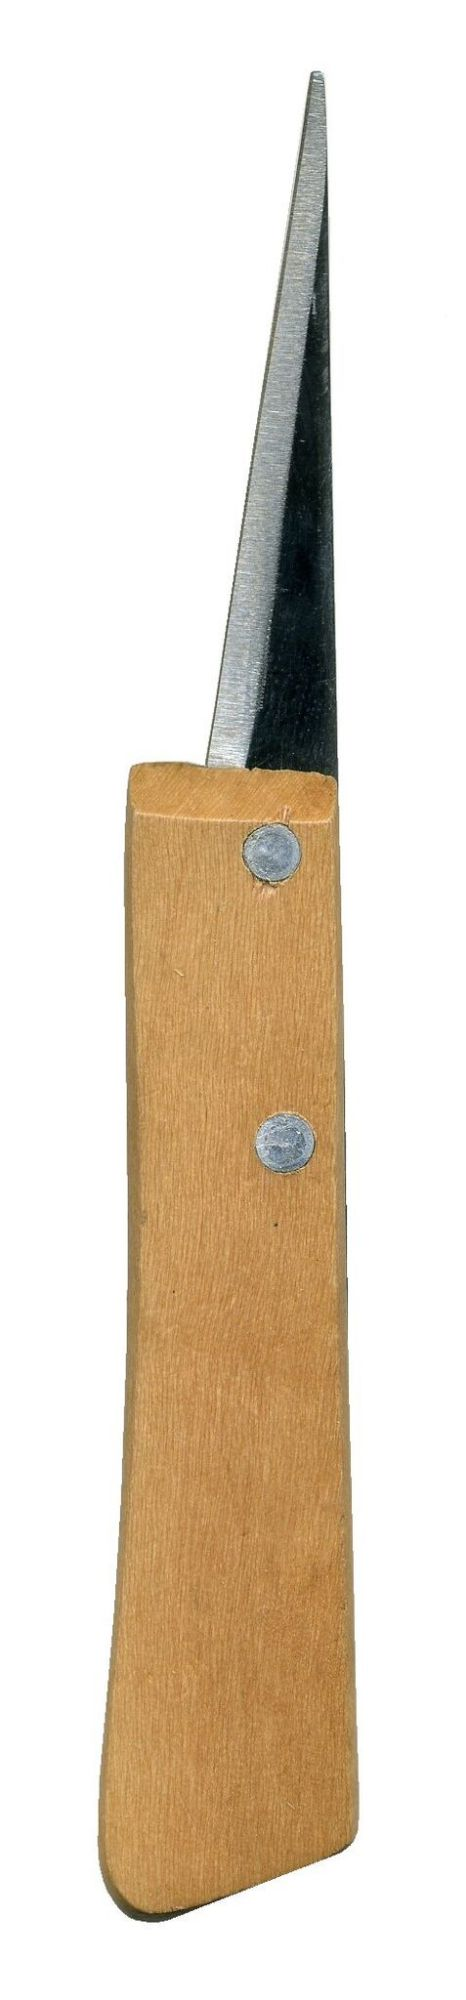 Potters Knife - 16.5cm - Each